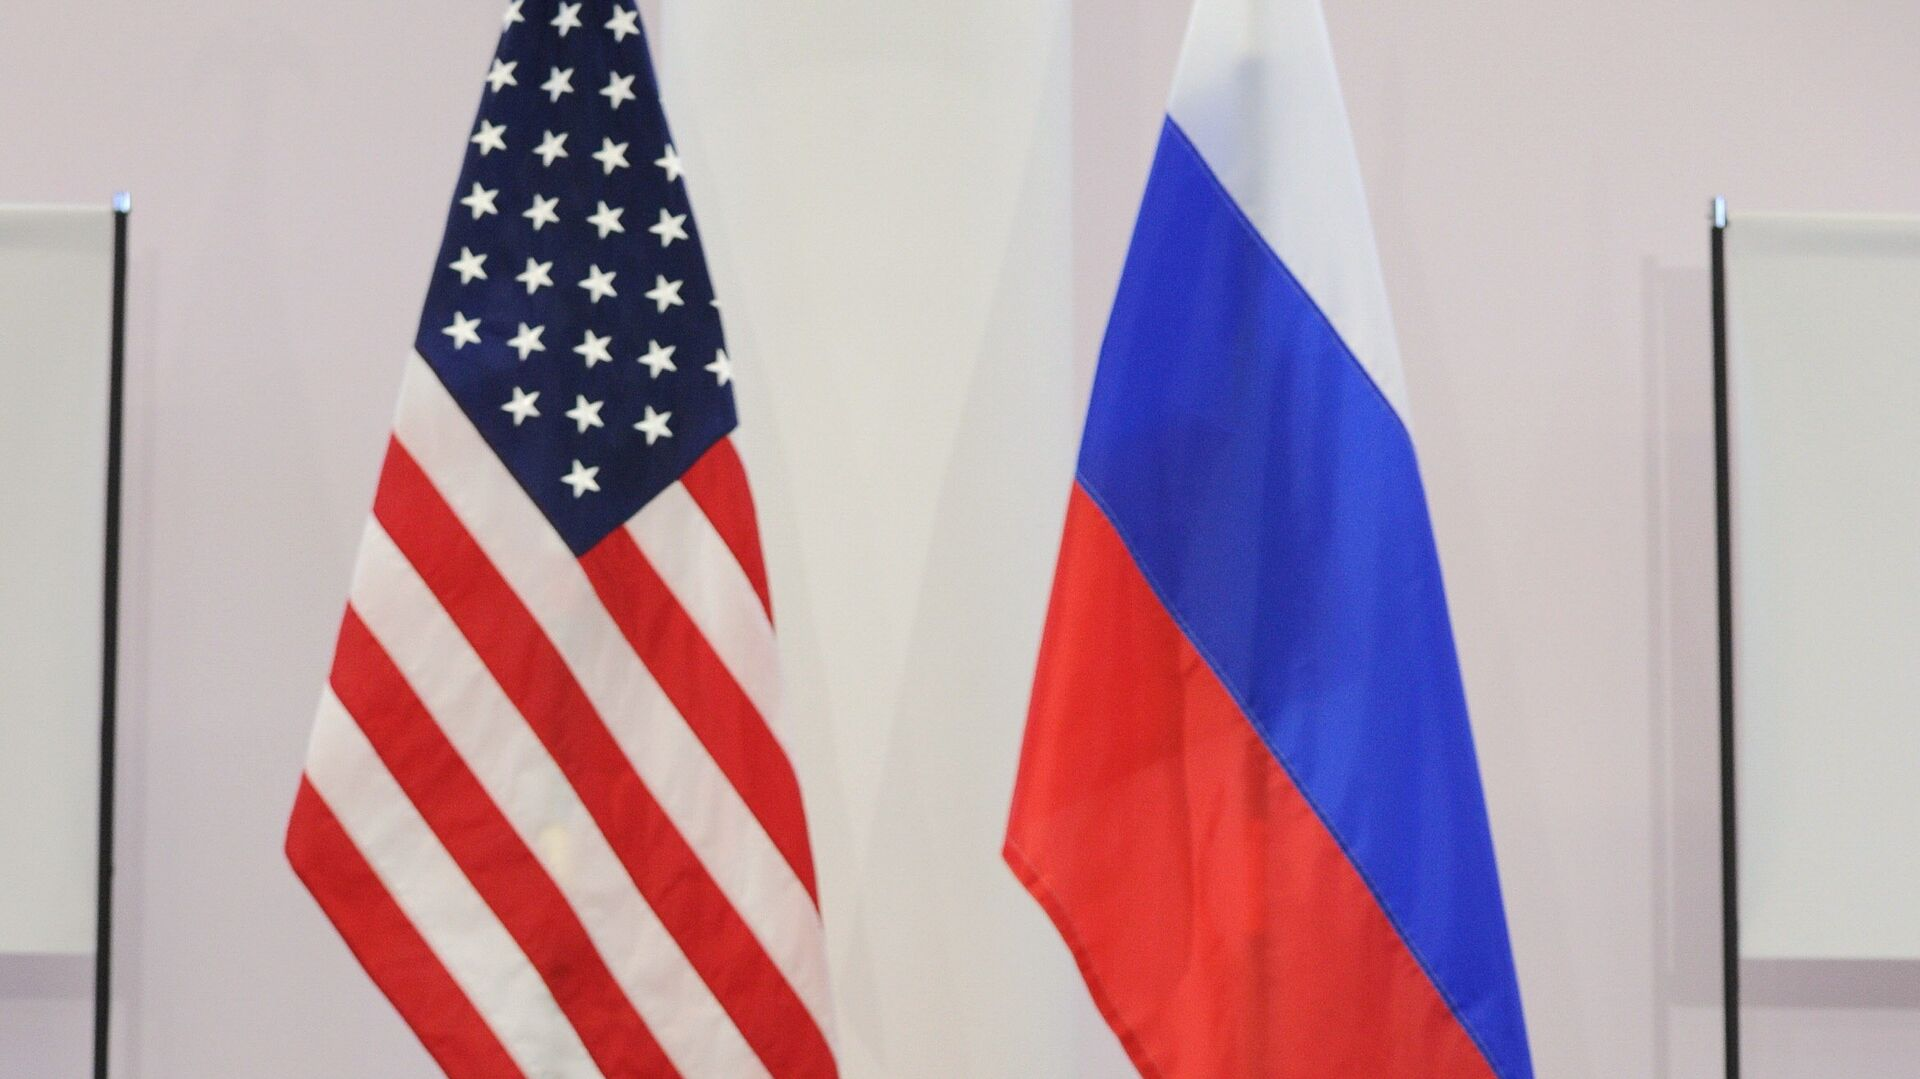 US and Russian flags - Sputnik Mundo, 1920, 14.10.2021